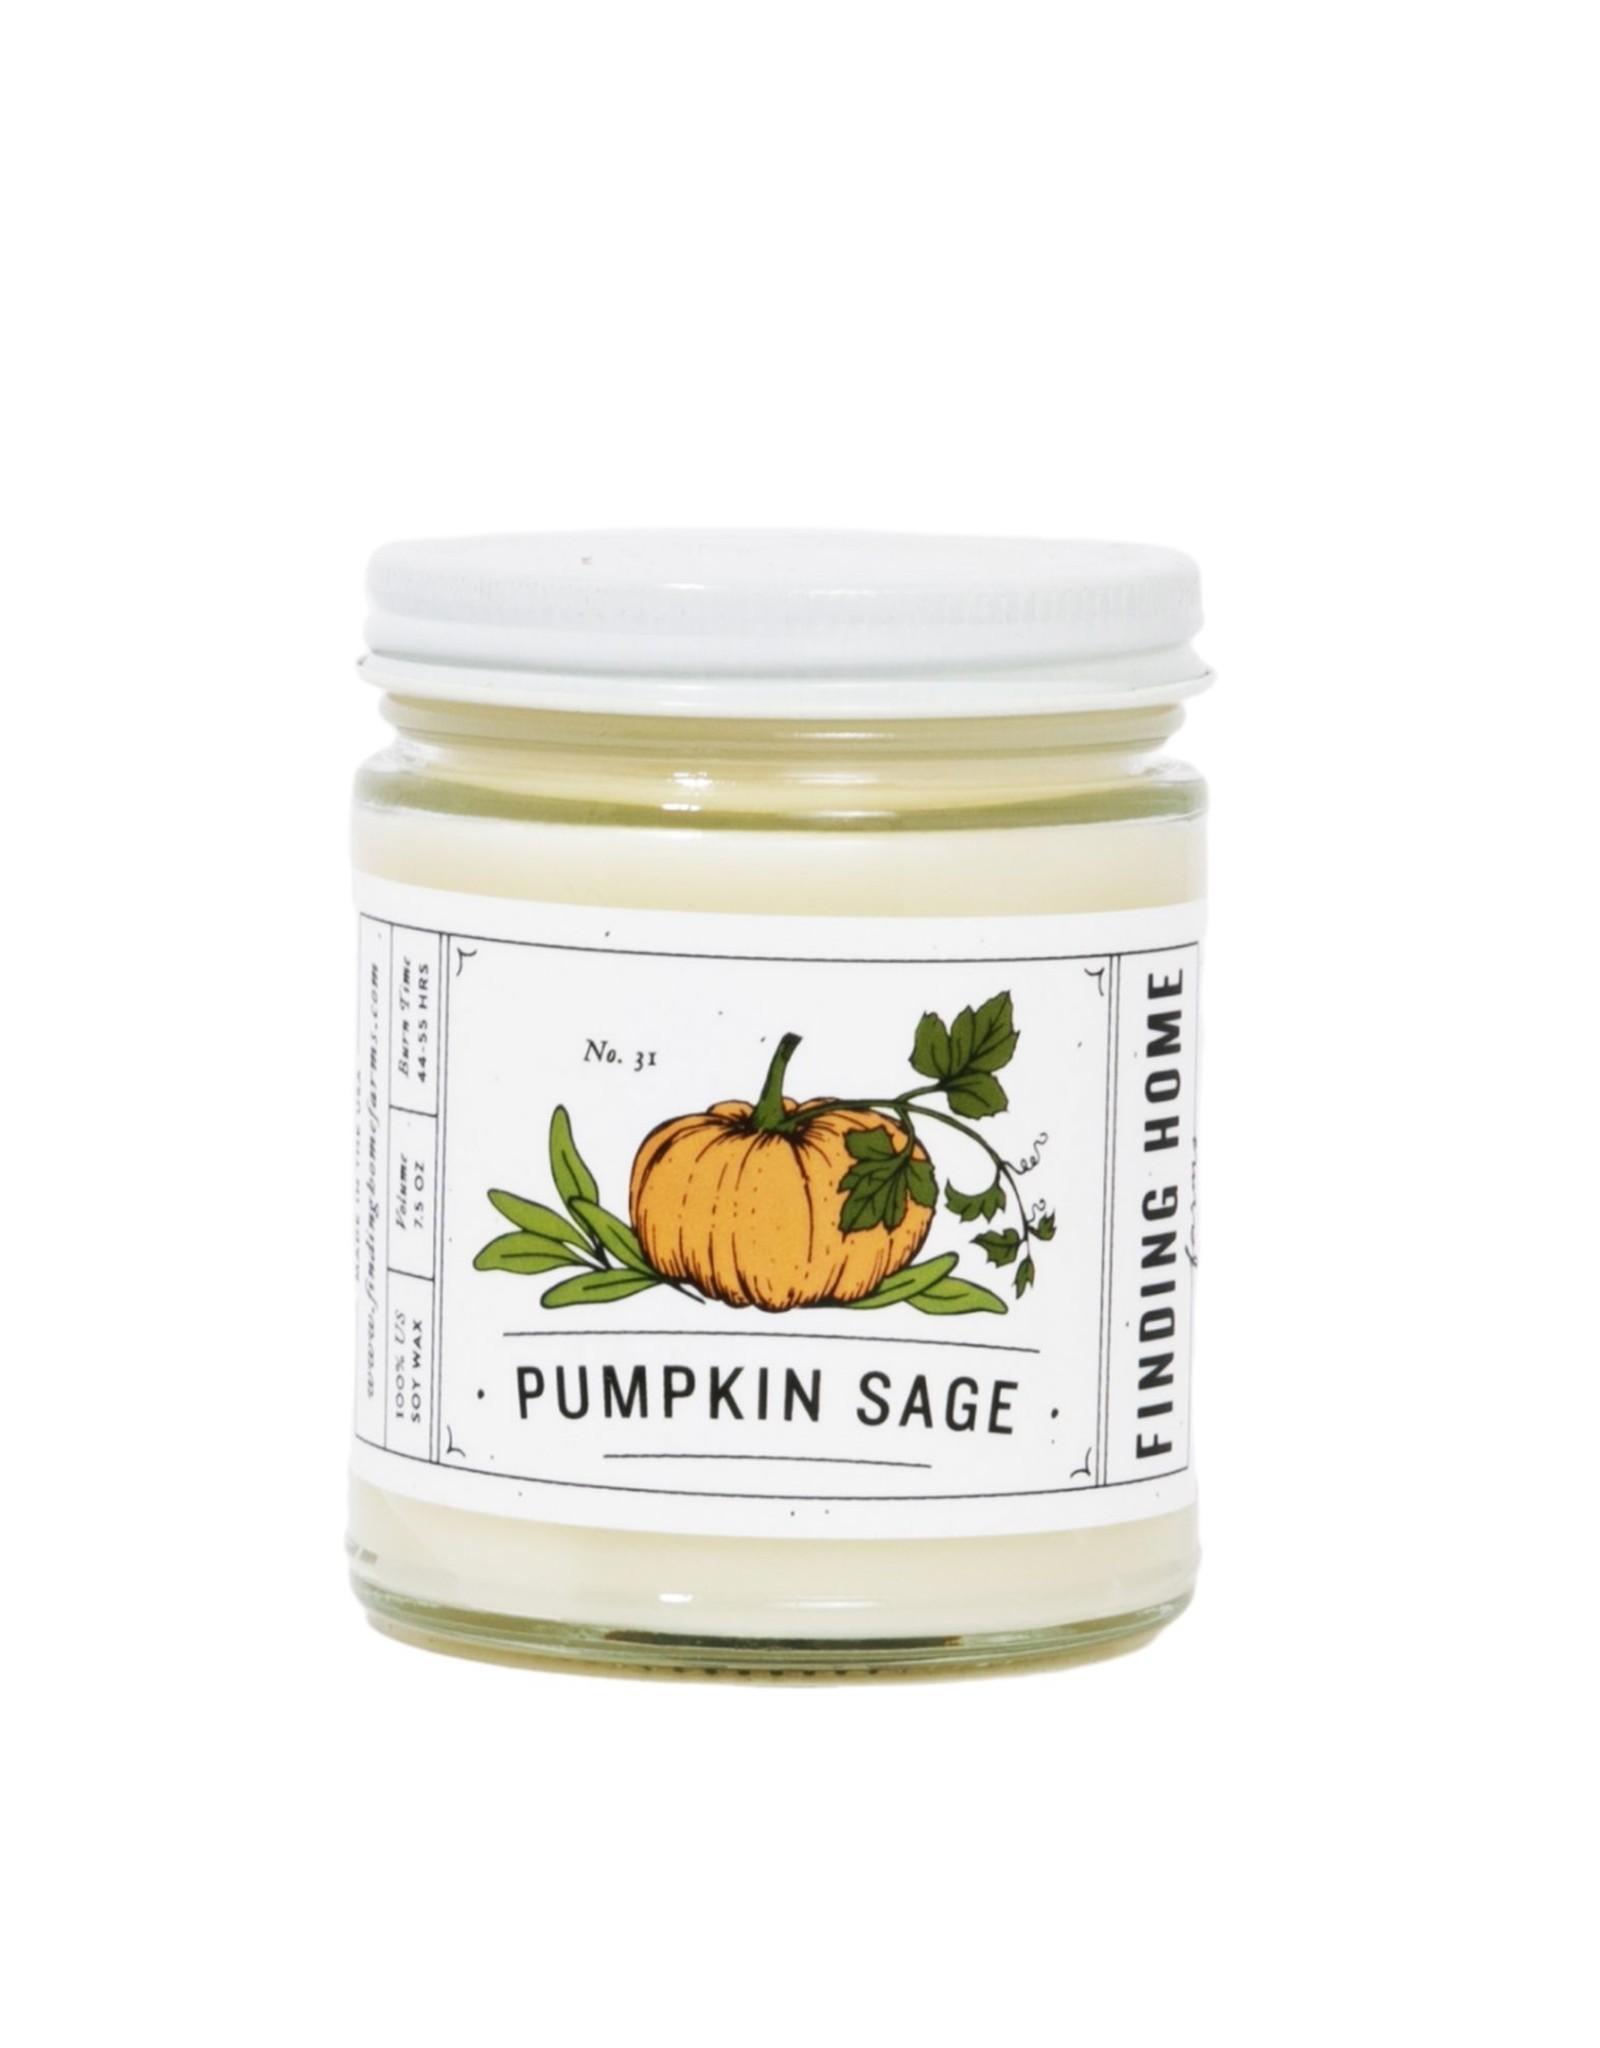 Finding Home Farms Pumpkin Sage Candle - 7.5oz